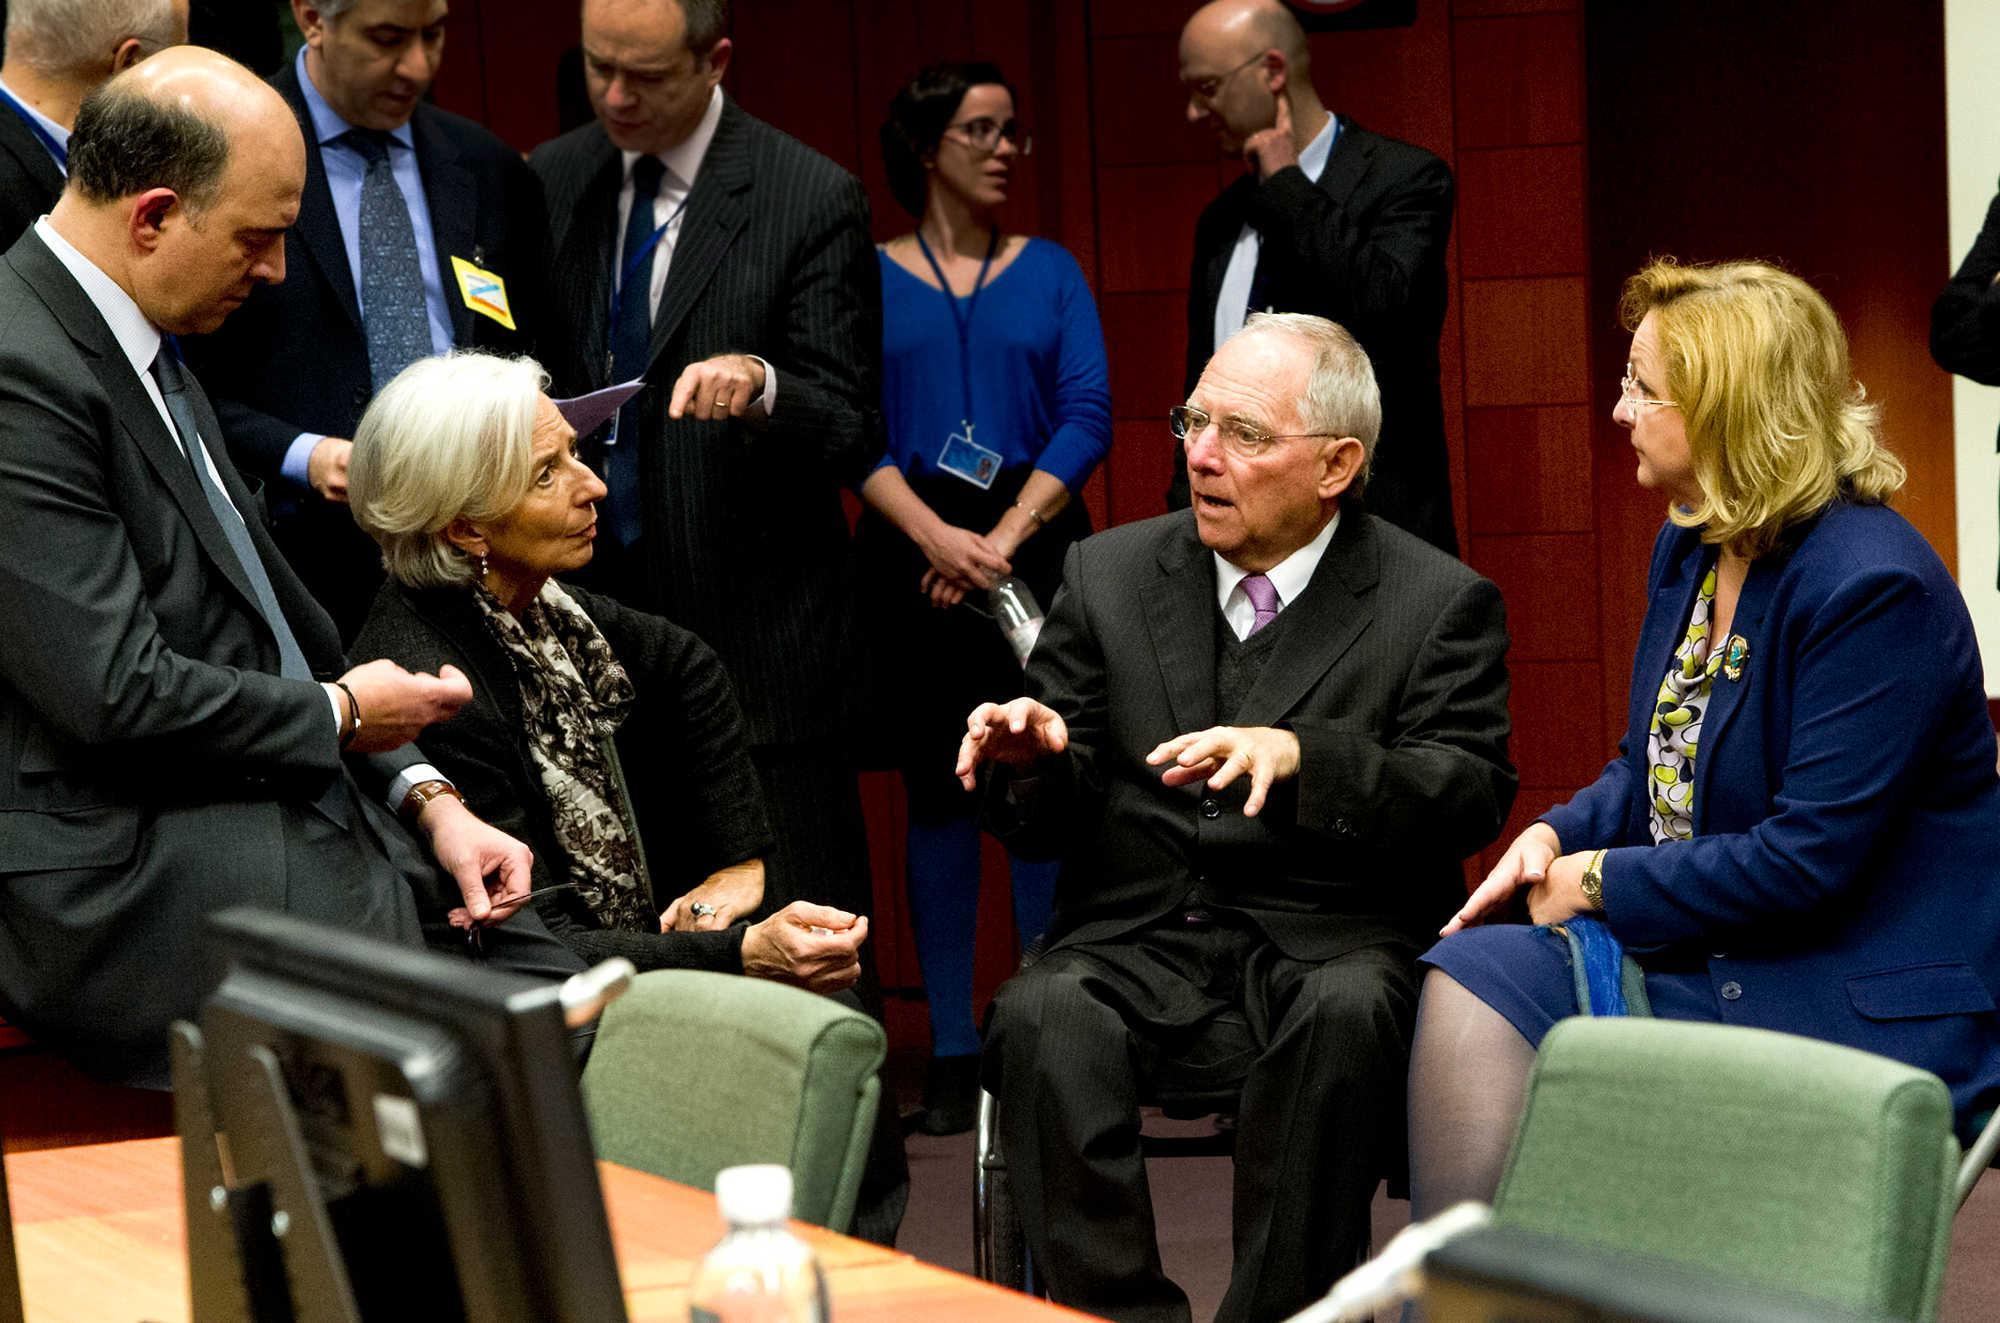 dnt-lagard-soimple-1300 Αξιολόγηση-θρίλερ με προληπτικά μέτρα και υποψία αδιεξόδου στο Eurogroup